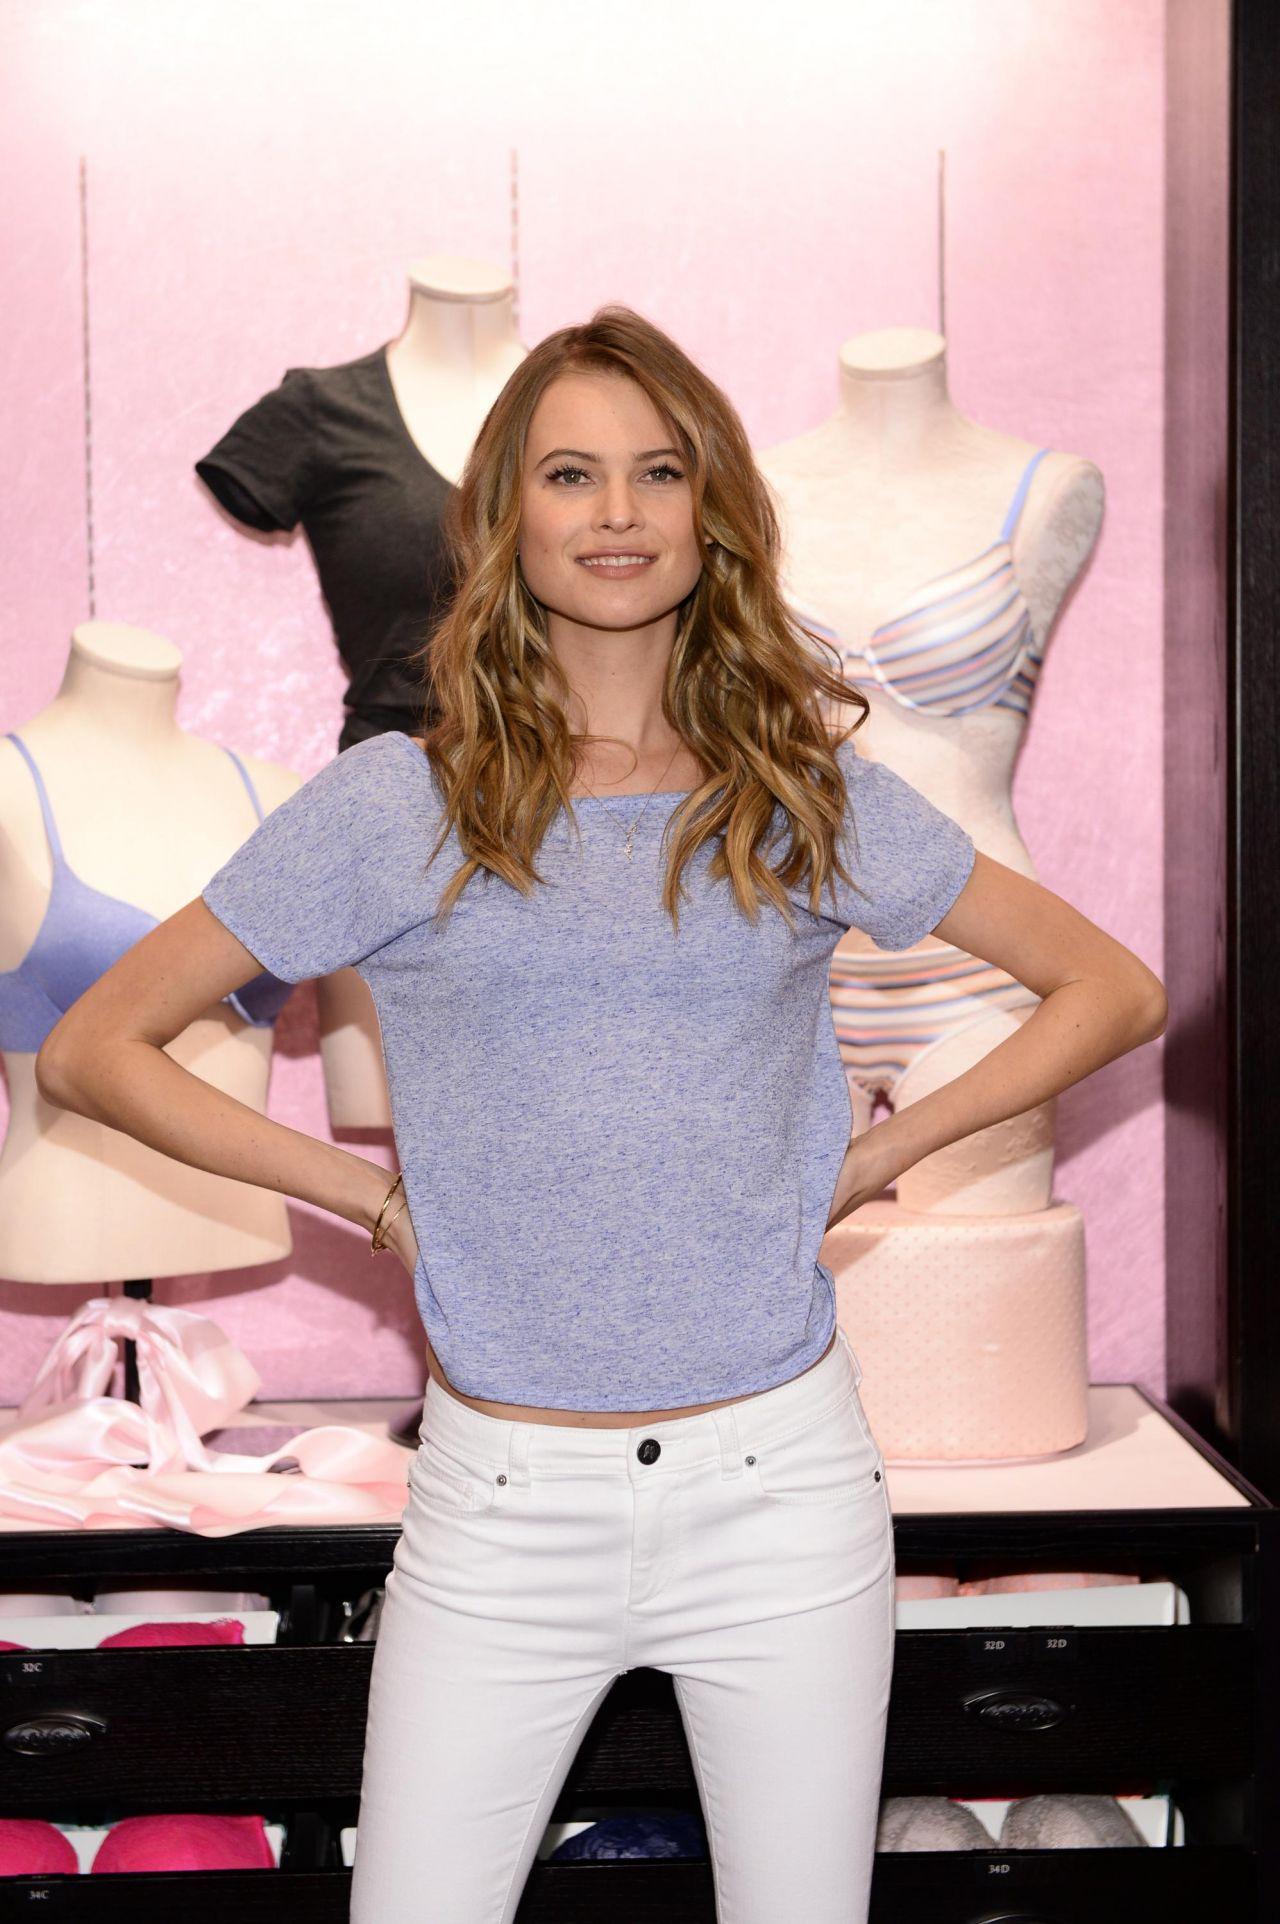 5c700c3b9be5f Behati Prinsloo - T-Shirt Bra Launch at Victoria's Secret in New ...